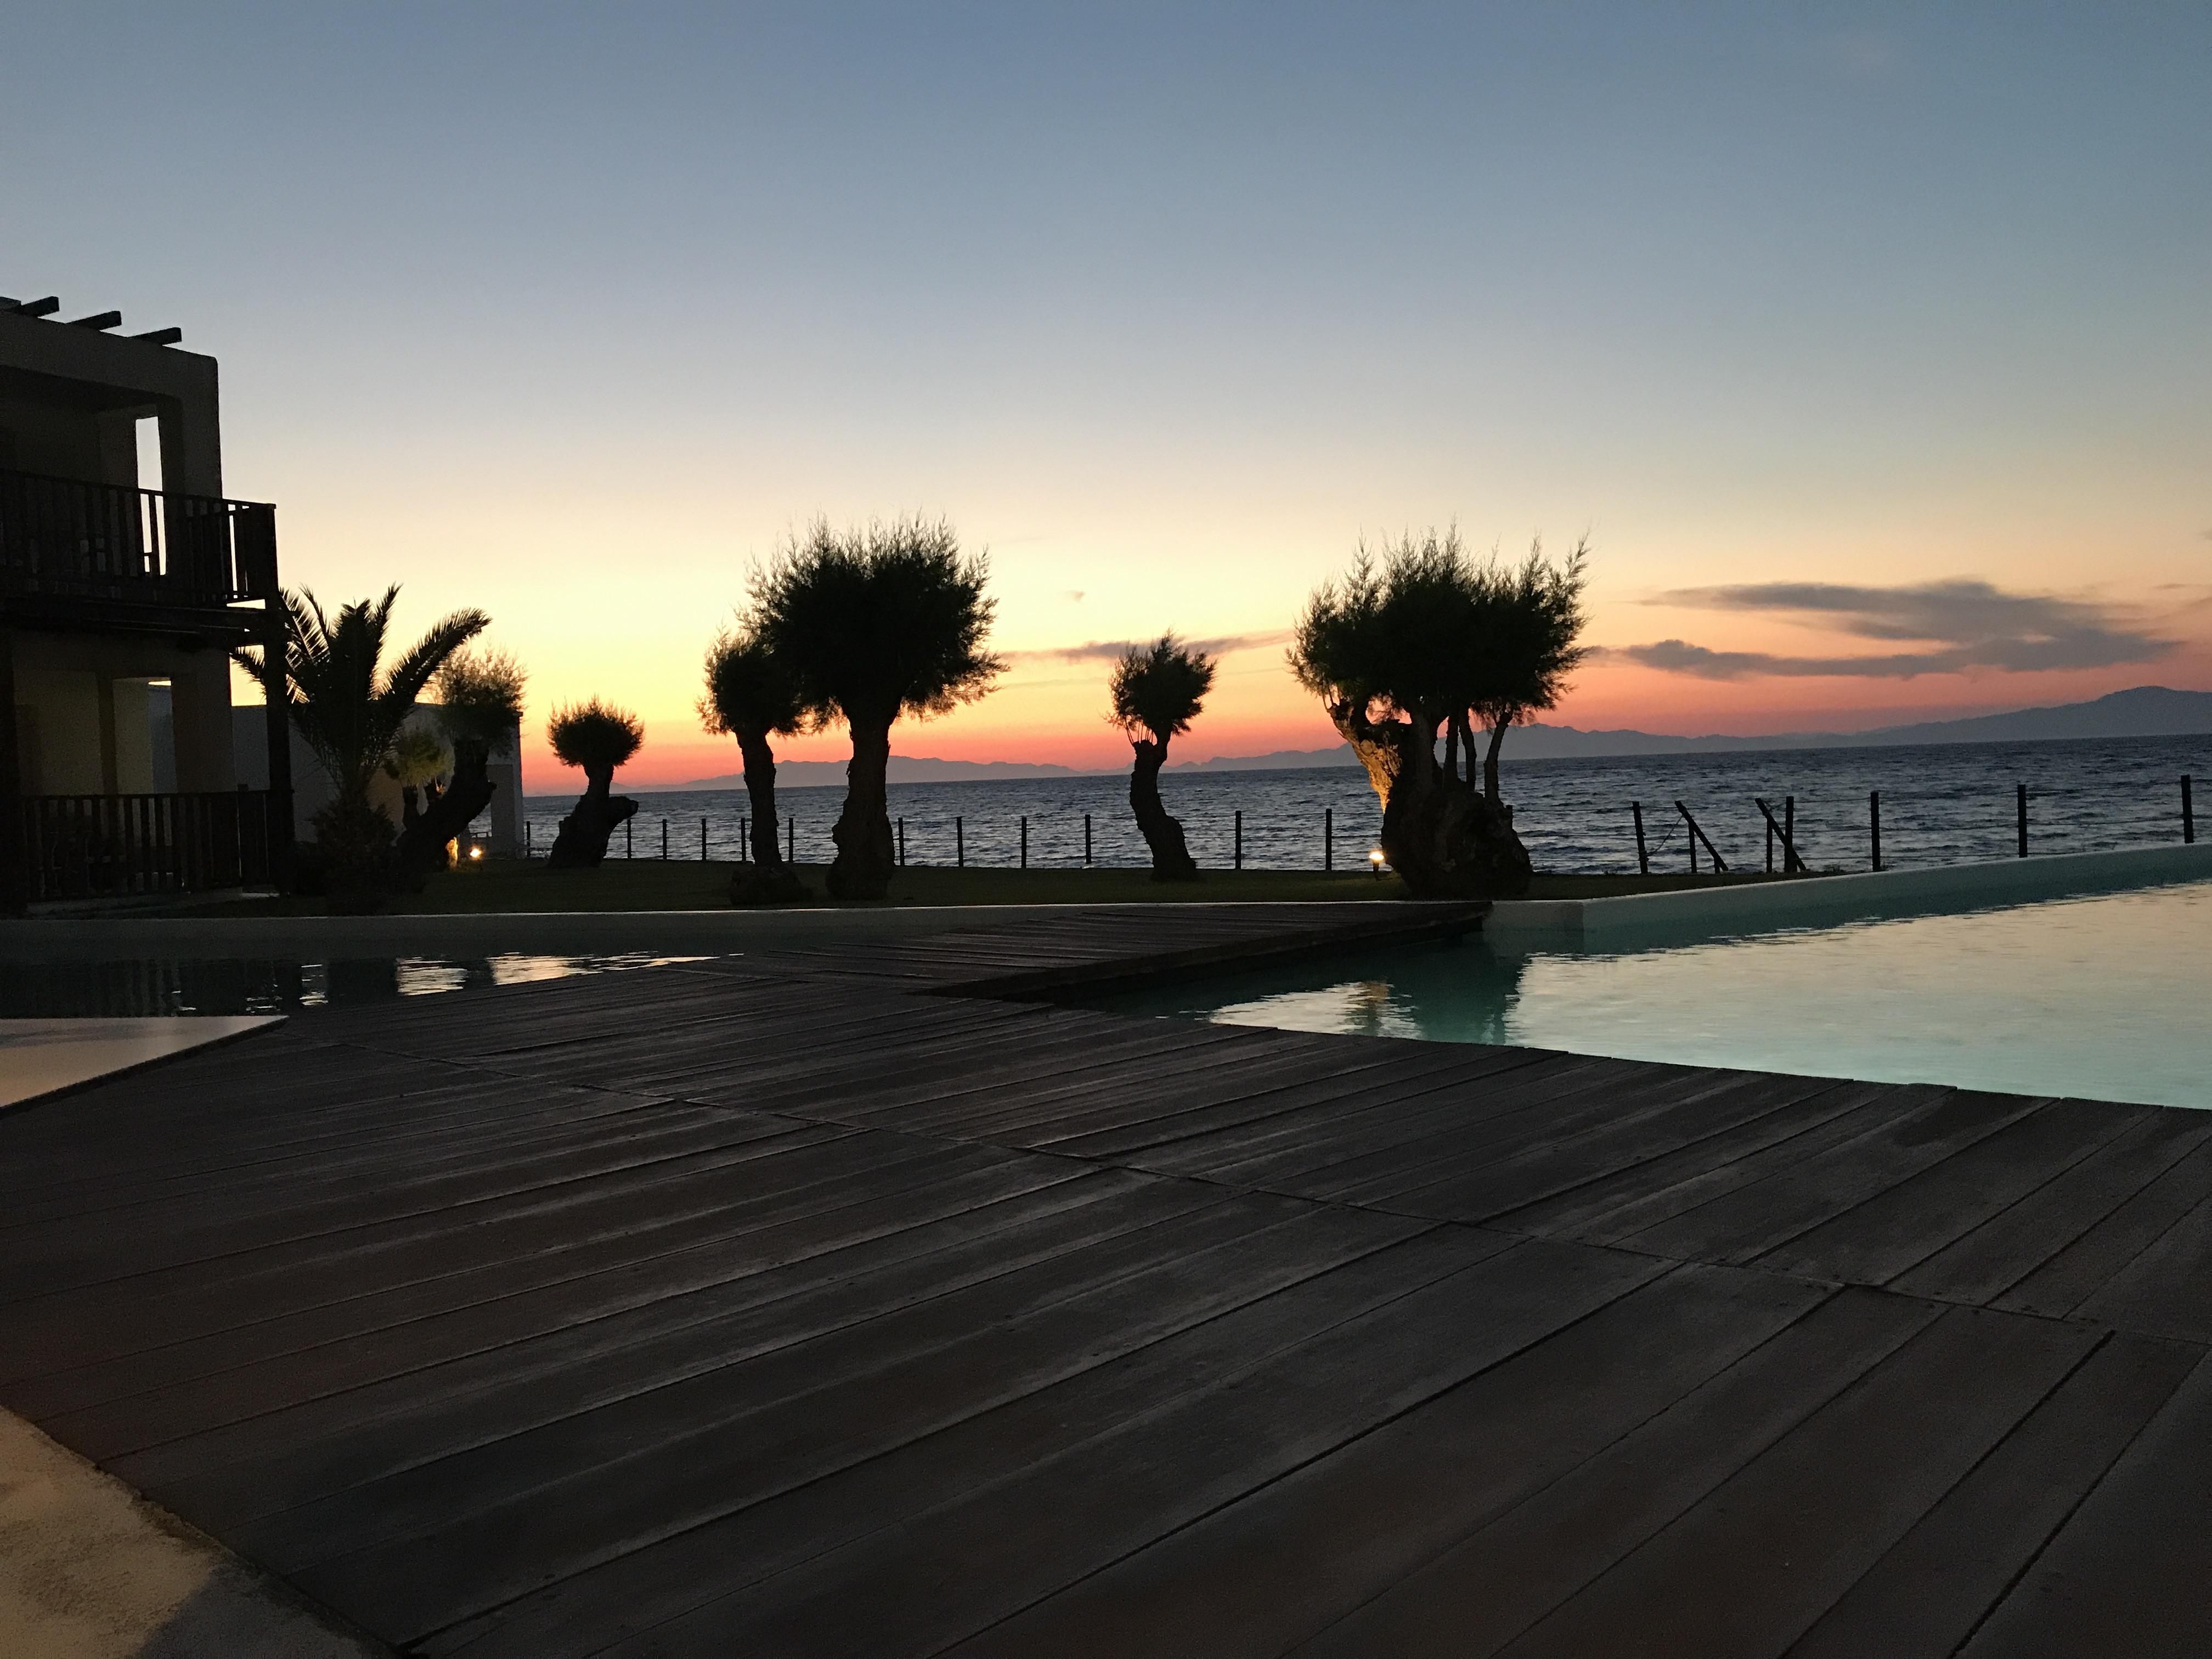 Sunprime Miramare beach